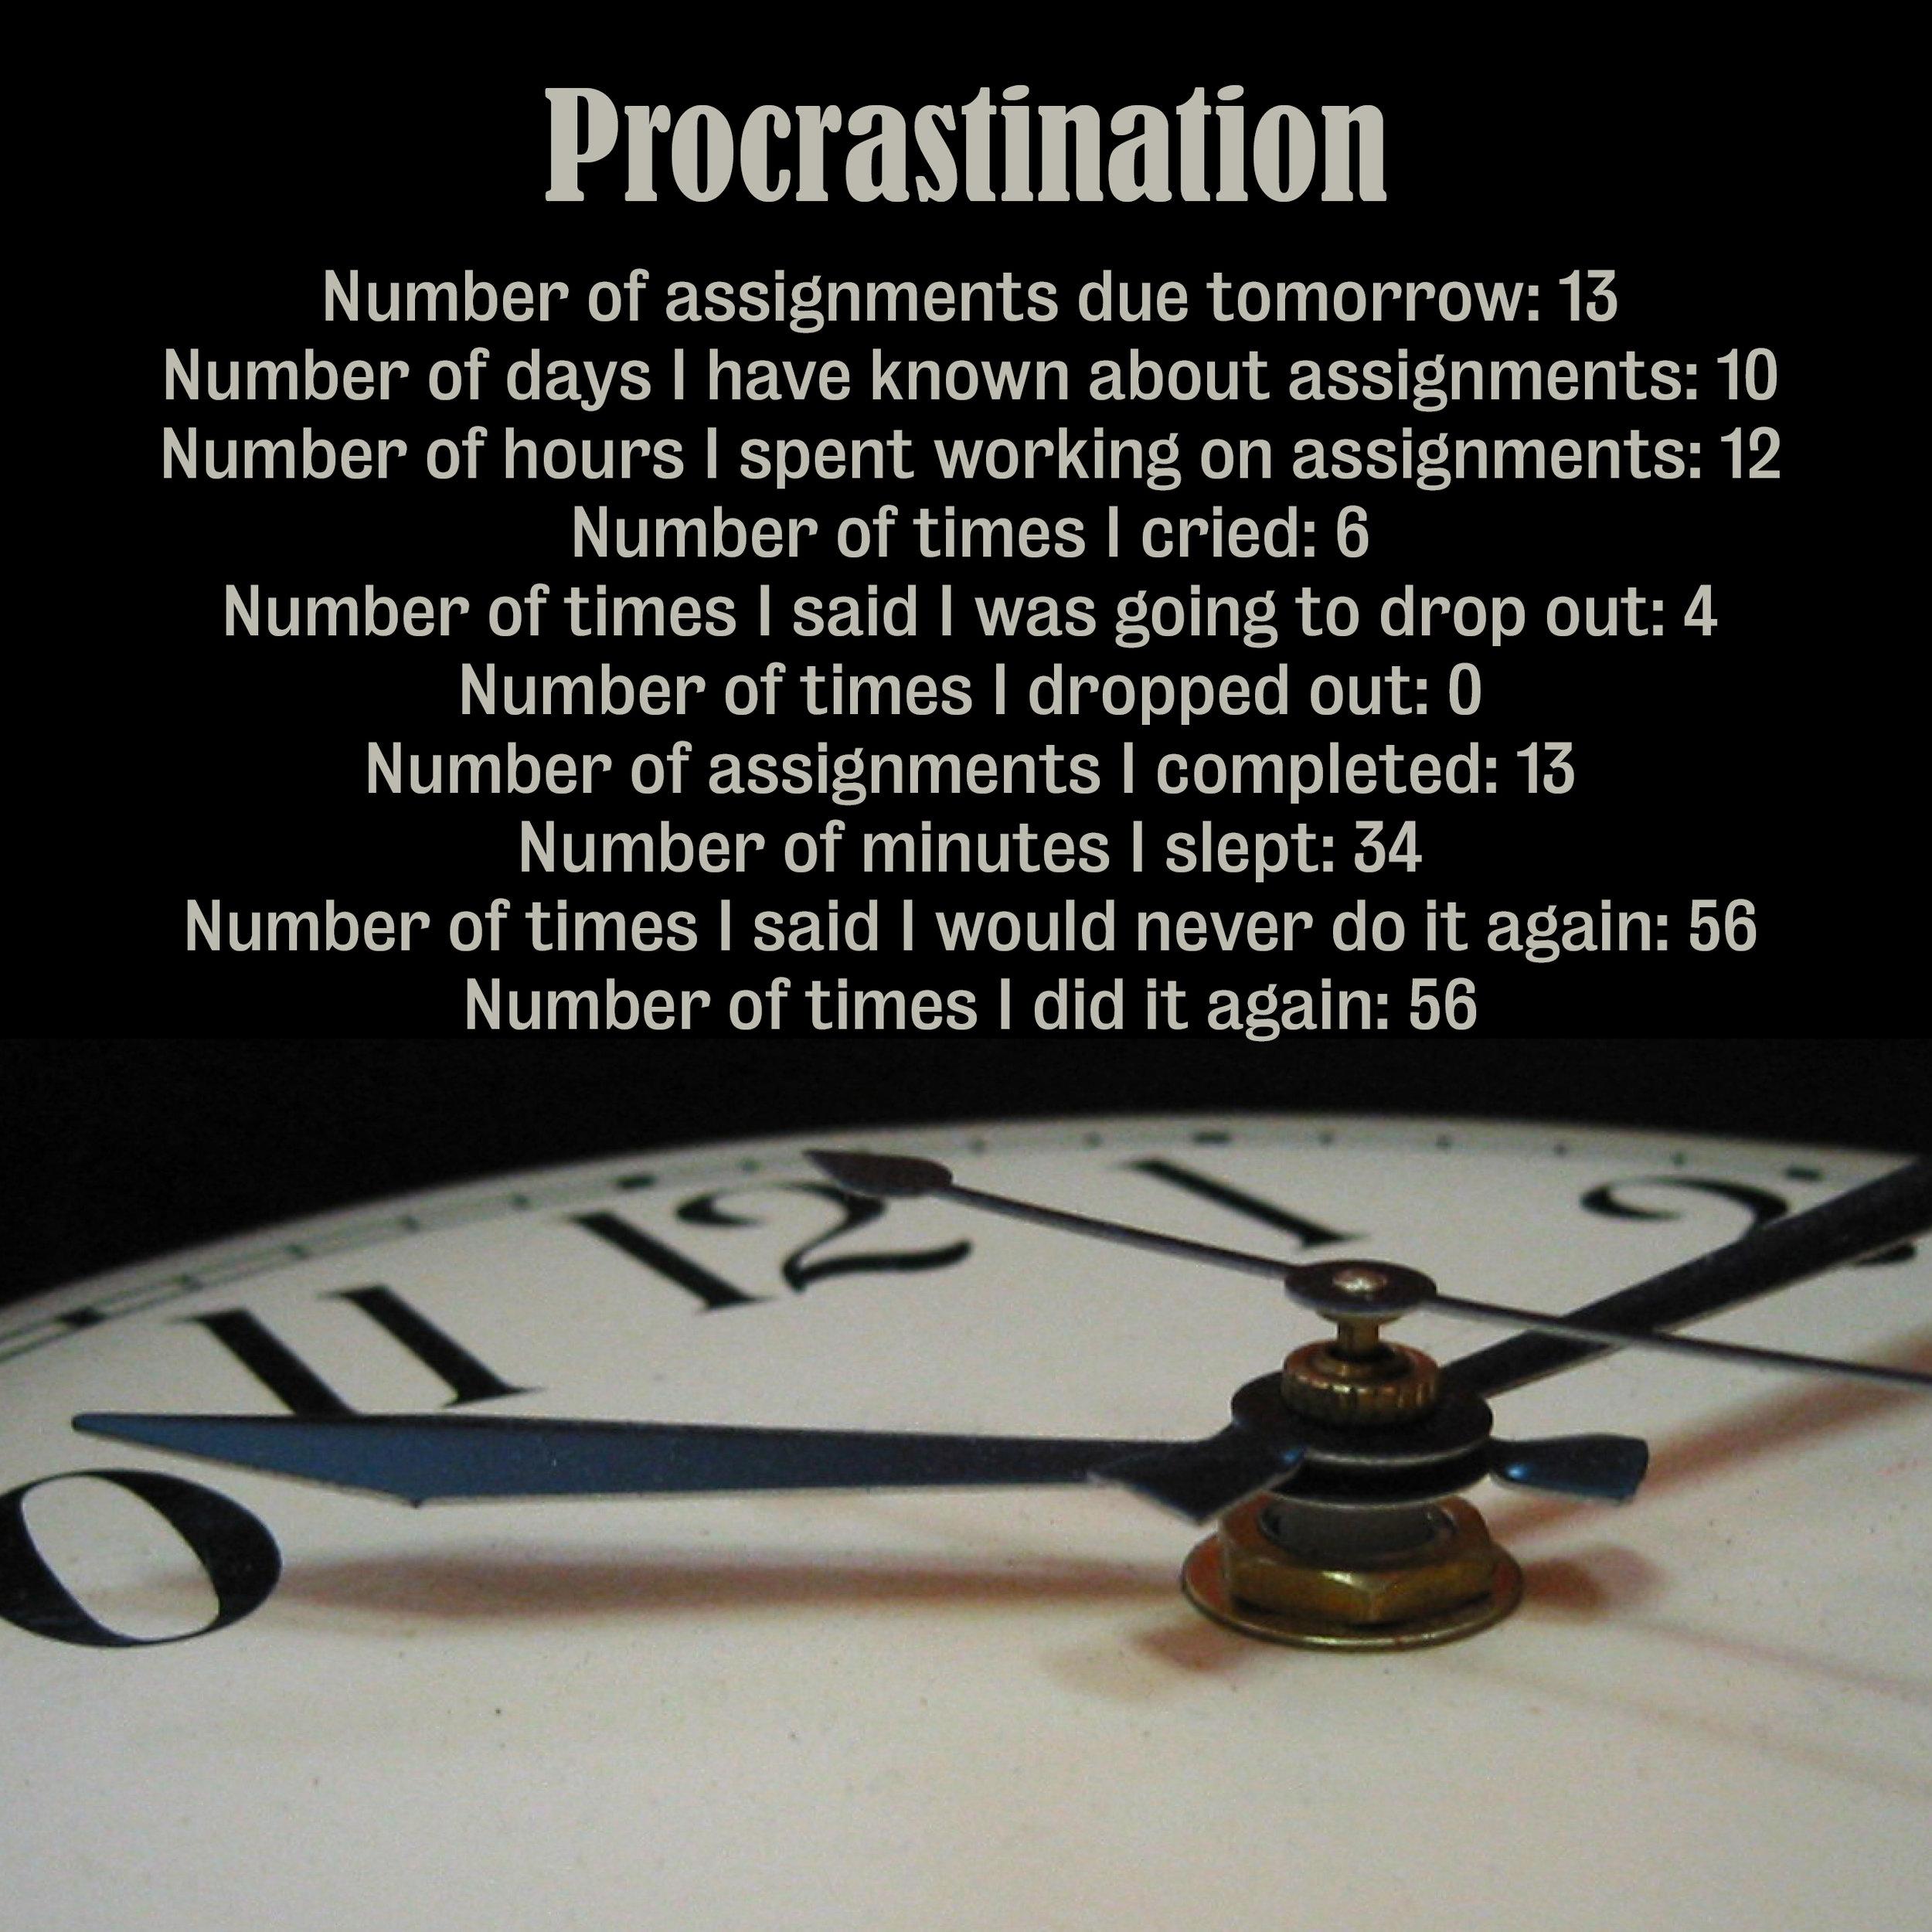 Procrastination statistics from last semester.